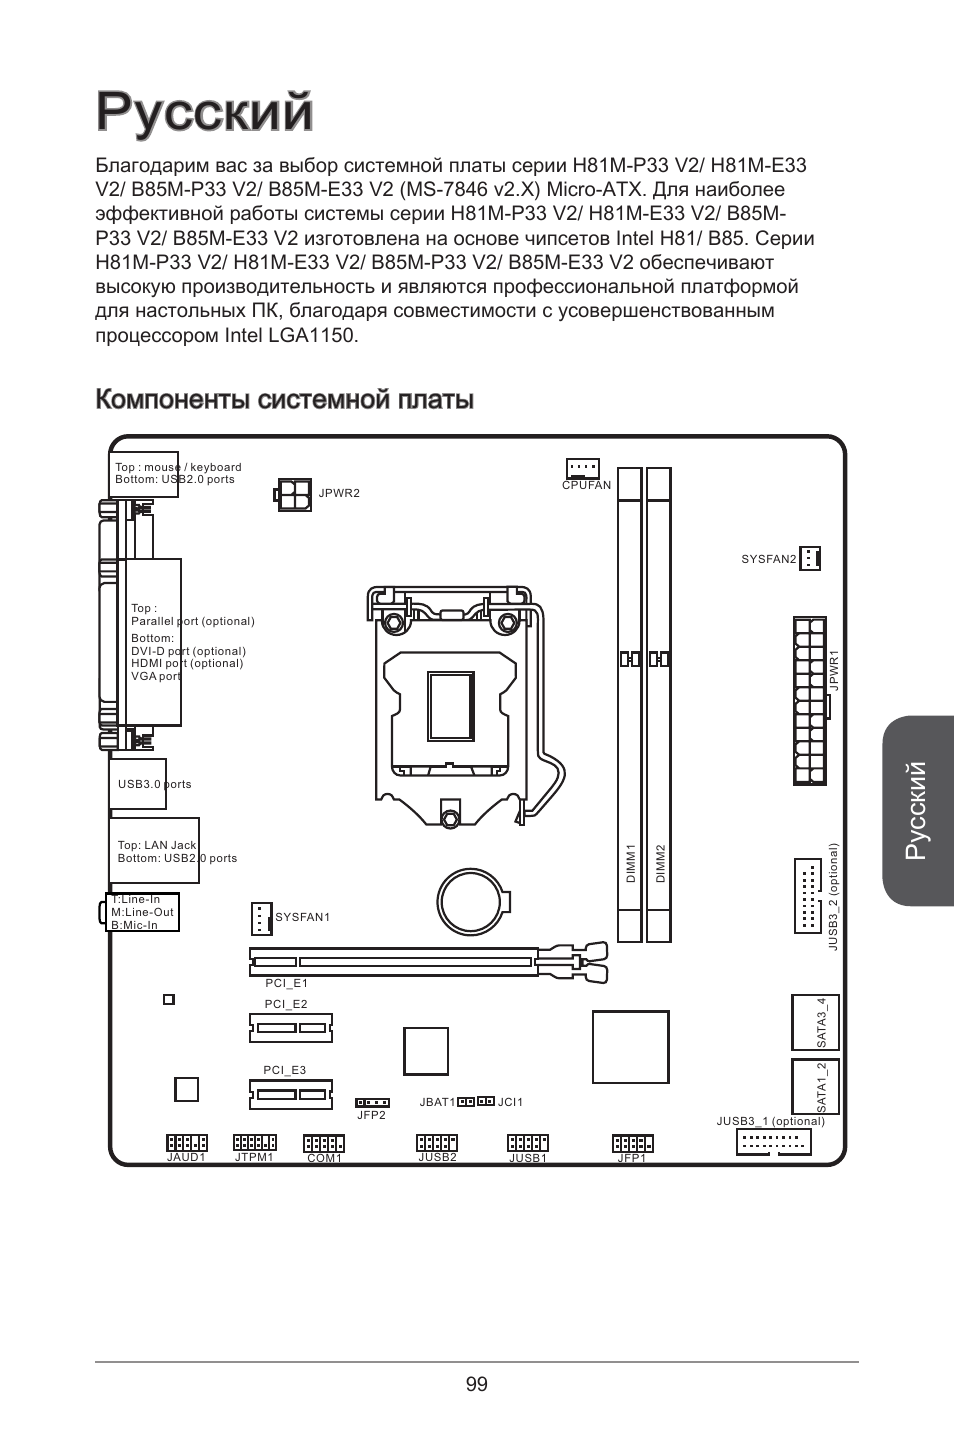 Msi Wiring Diagram Schematics Diagrams Mci H81m E33 Free Download U2022 Oasis Dl Co